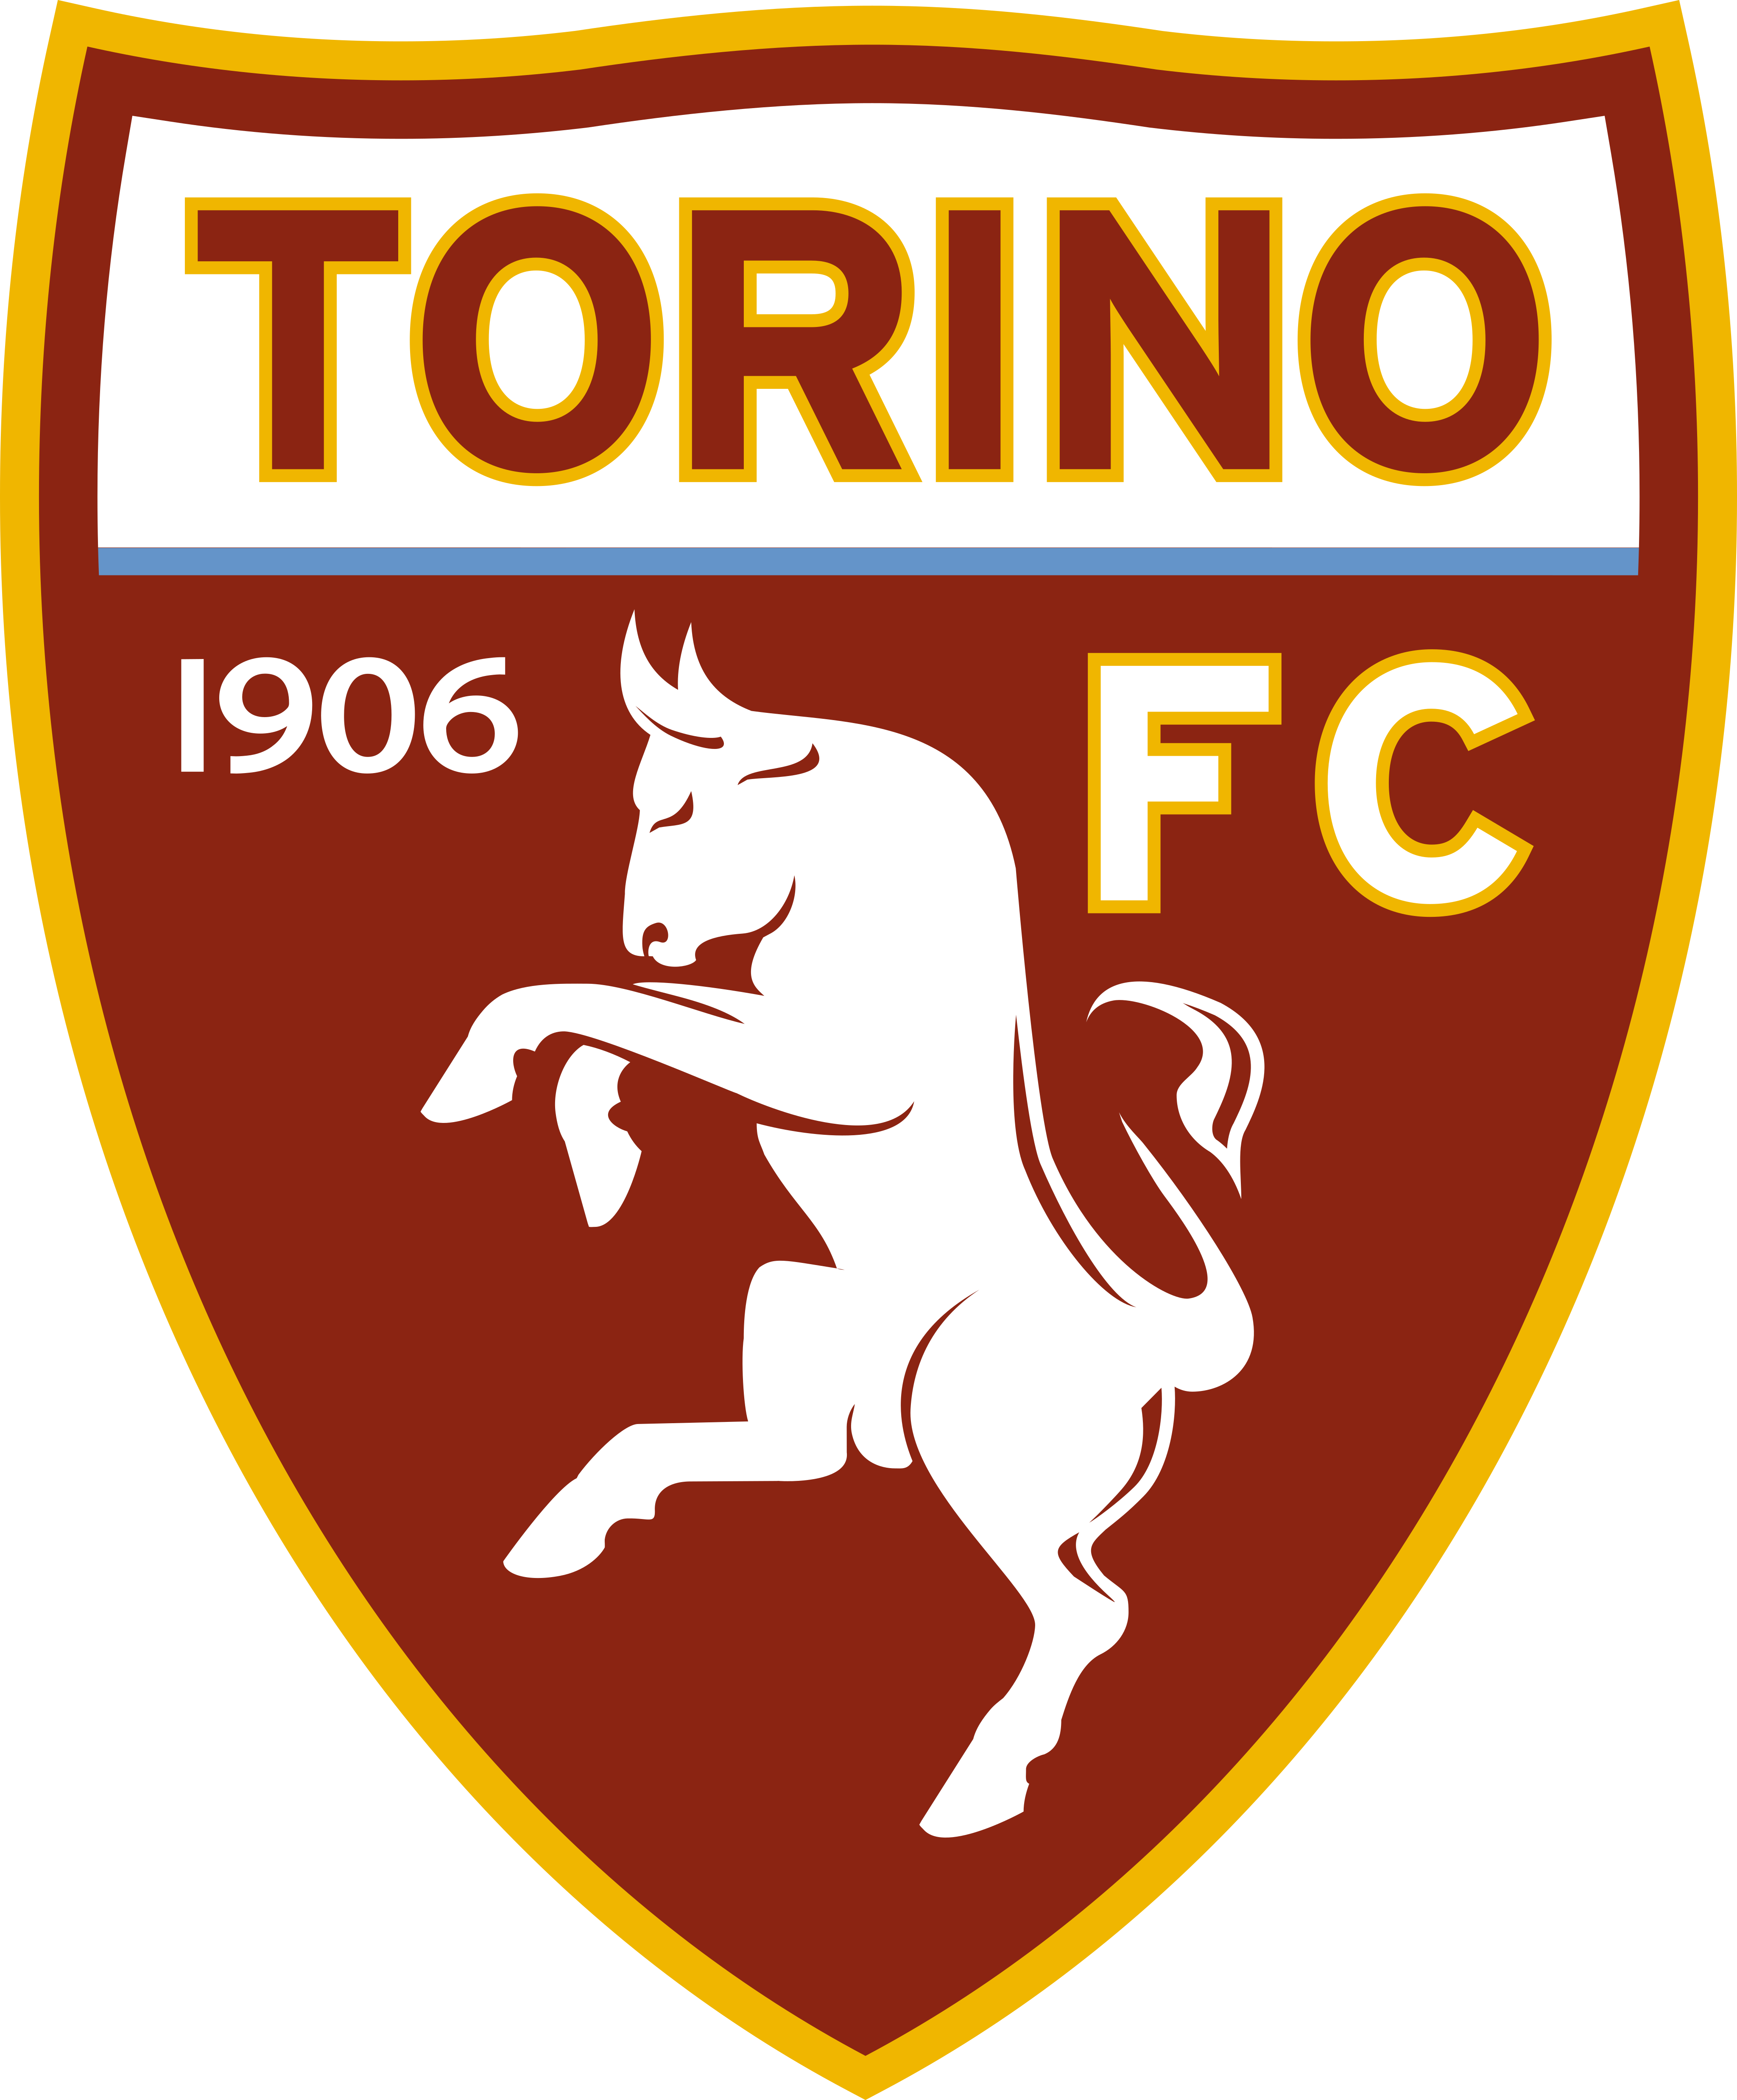 torino fc logo - Torino FC Logo